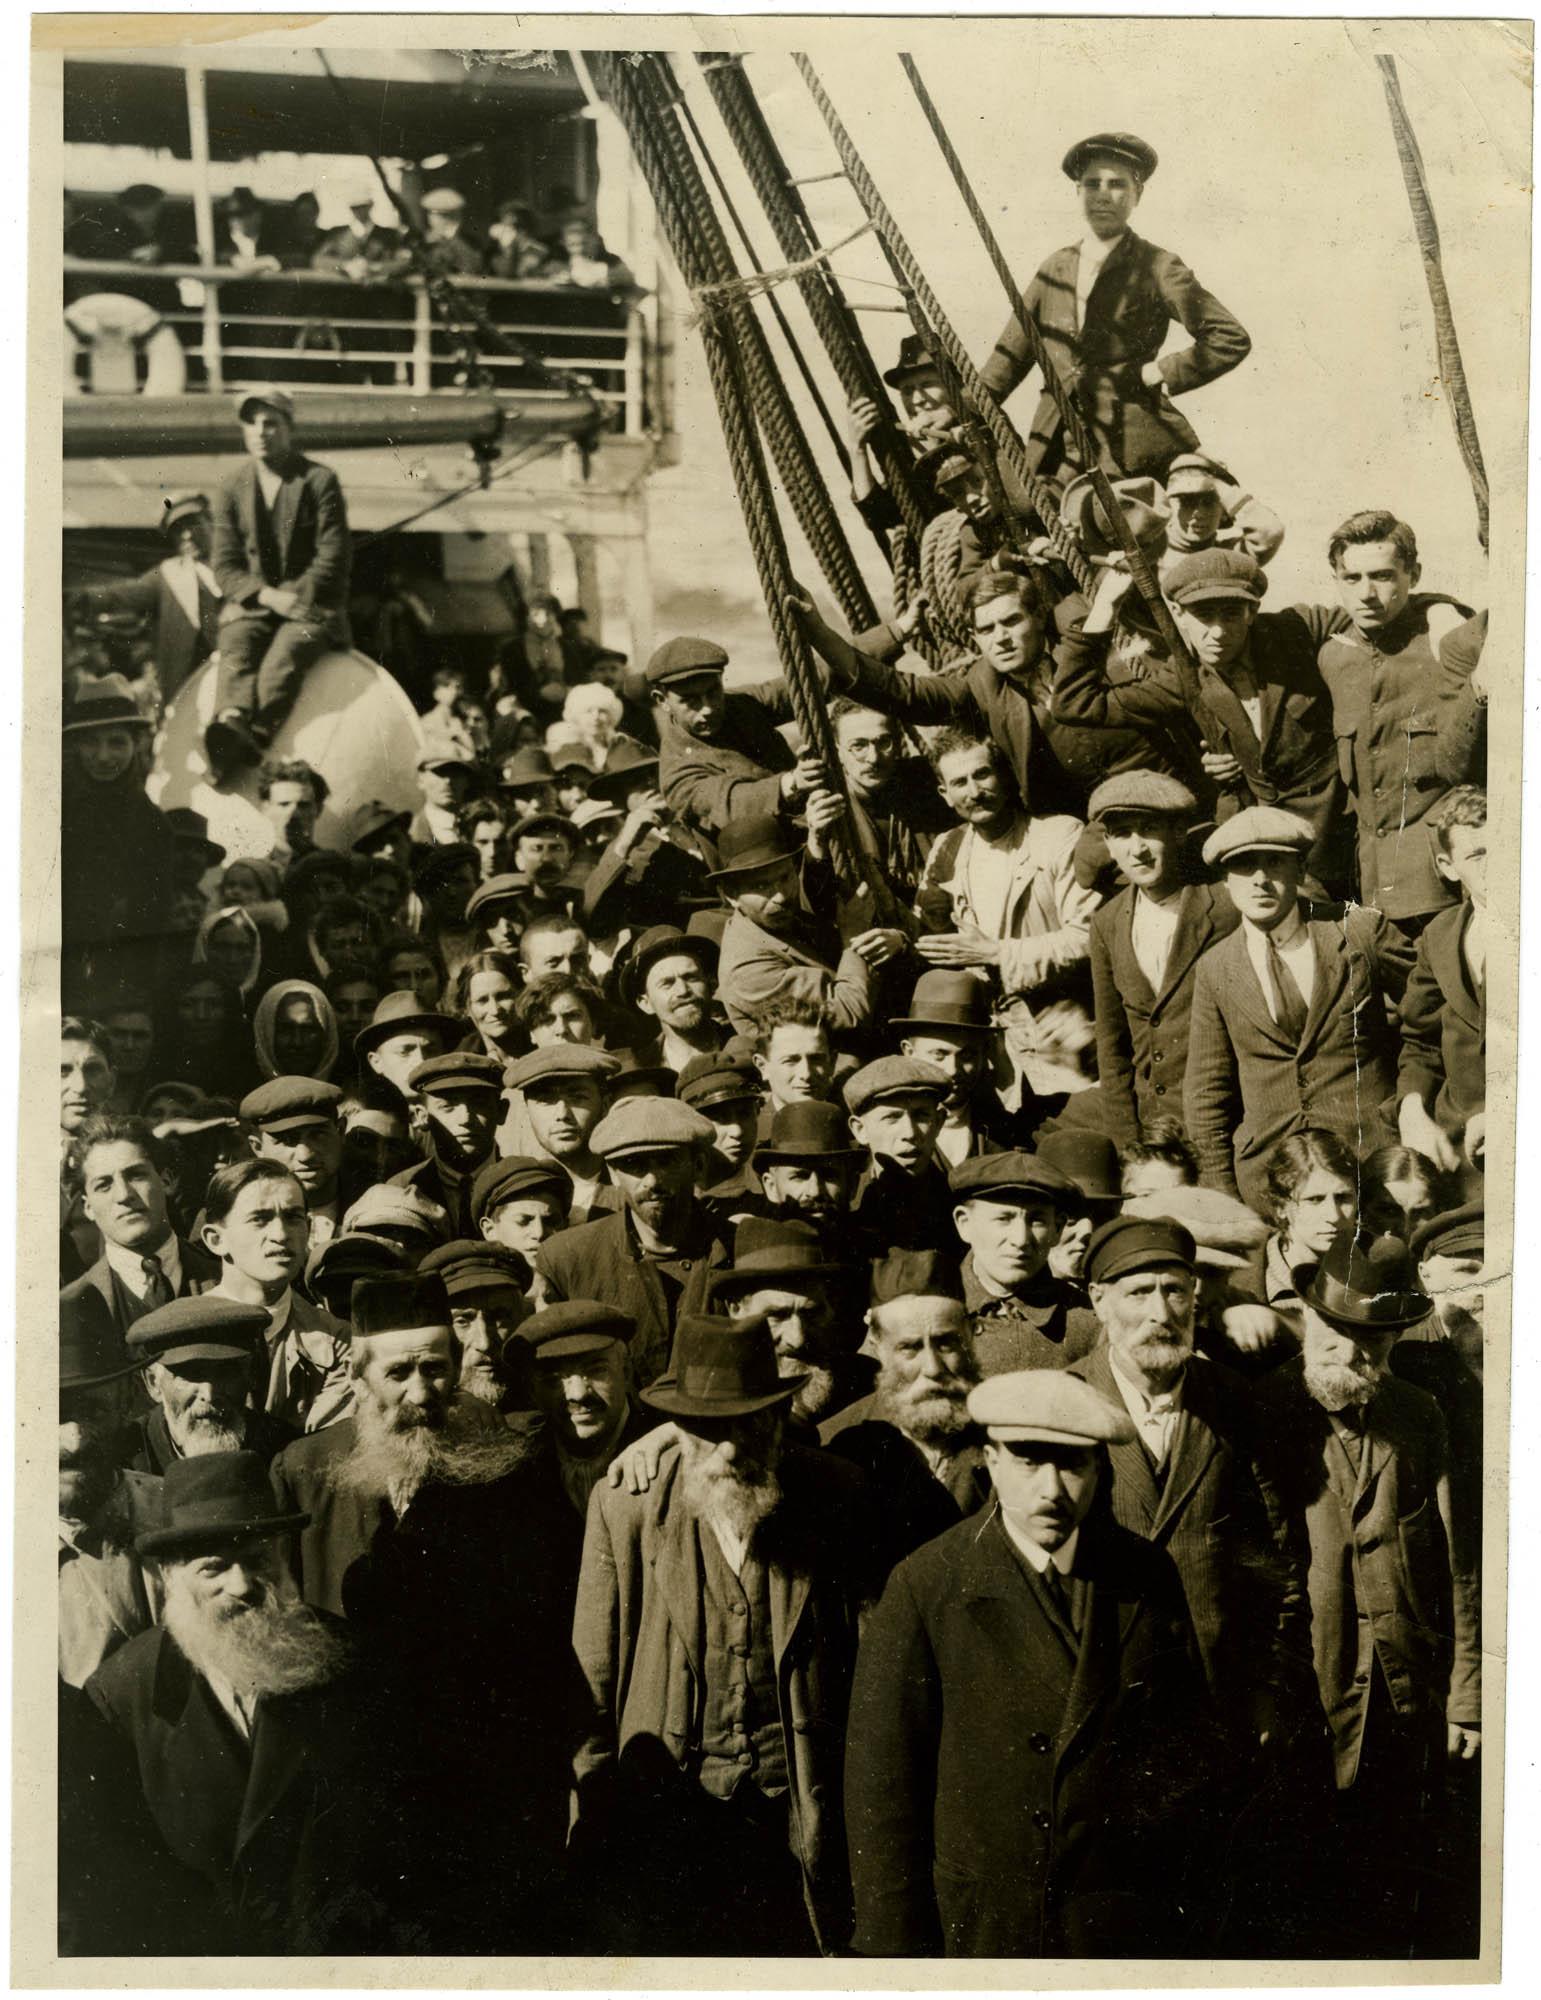 [Jewish immigrants on board ship]